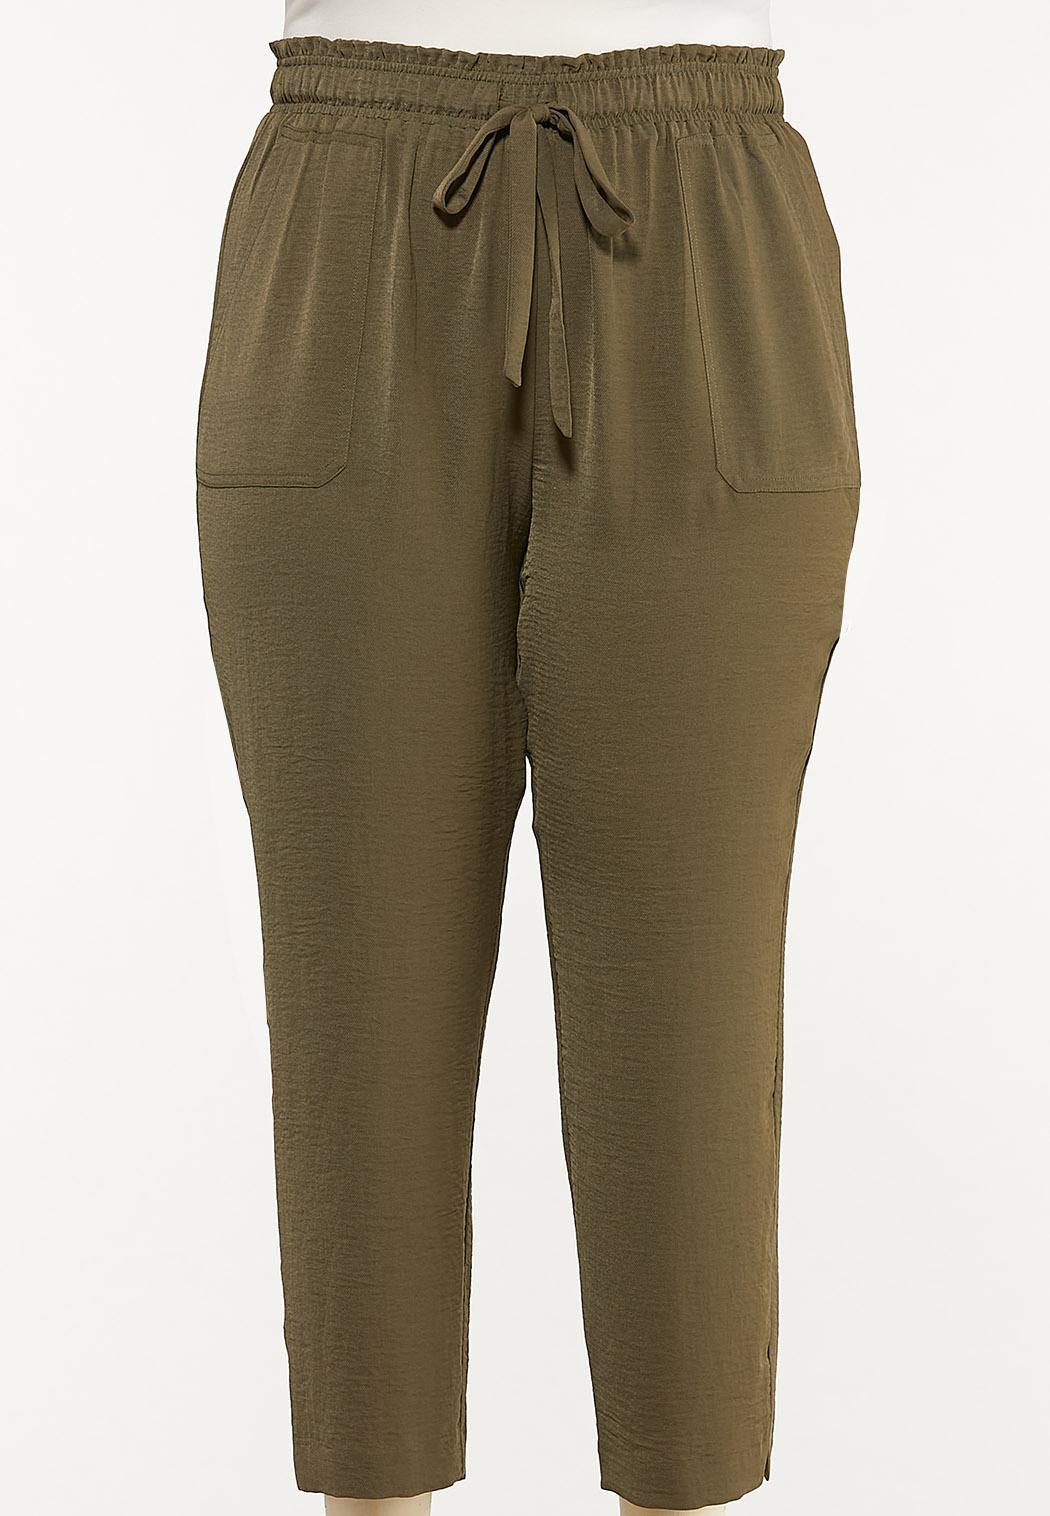 Plus Size Olive Track Pants